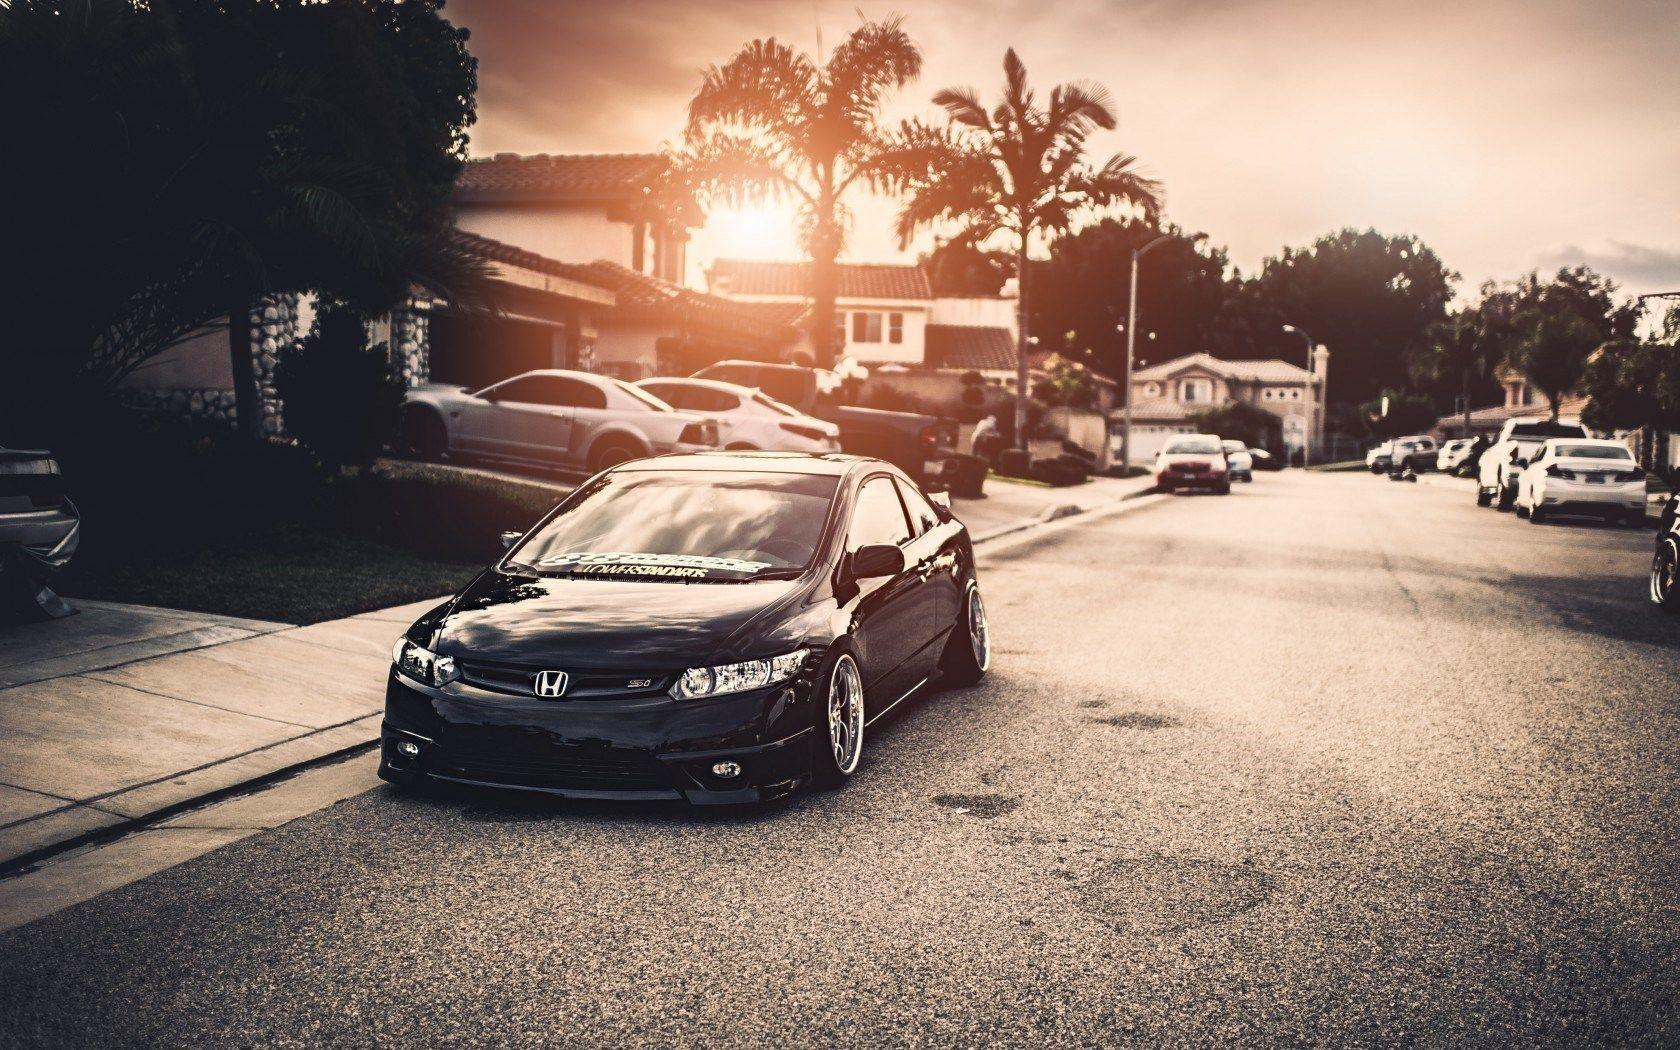 Honda Civic Wallpapers Top Free Honda Civic Backgrounds